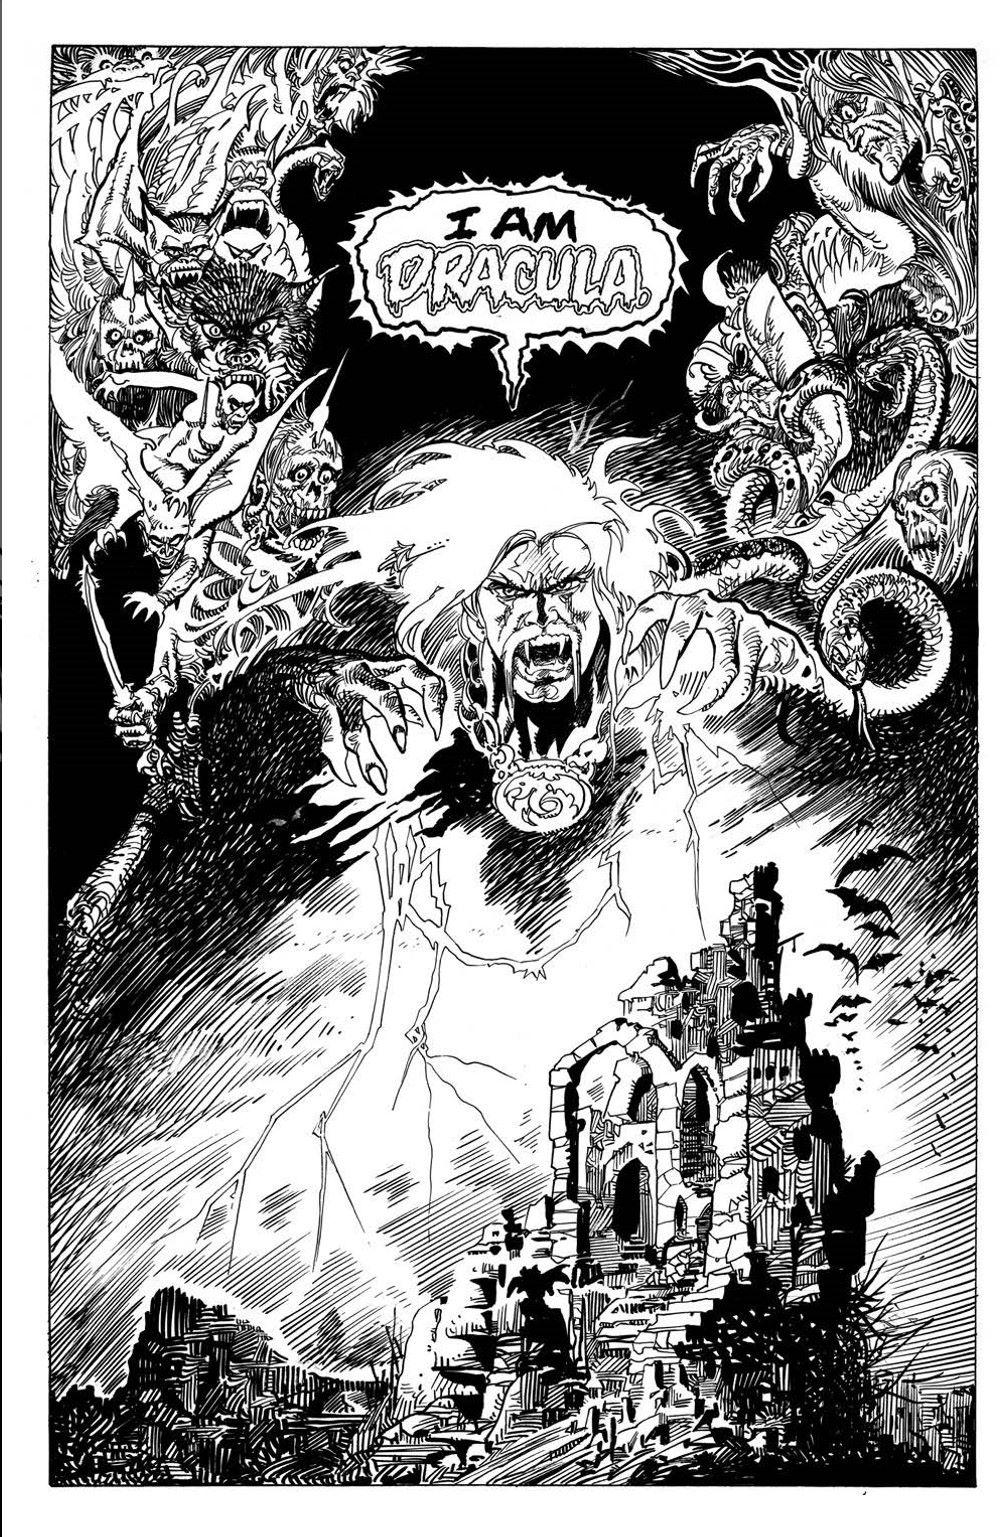 VladTheImpaler_TPB_pr-3 ComicList Previews: DRACULA VLAD THE IMPALER GN